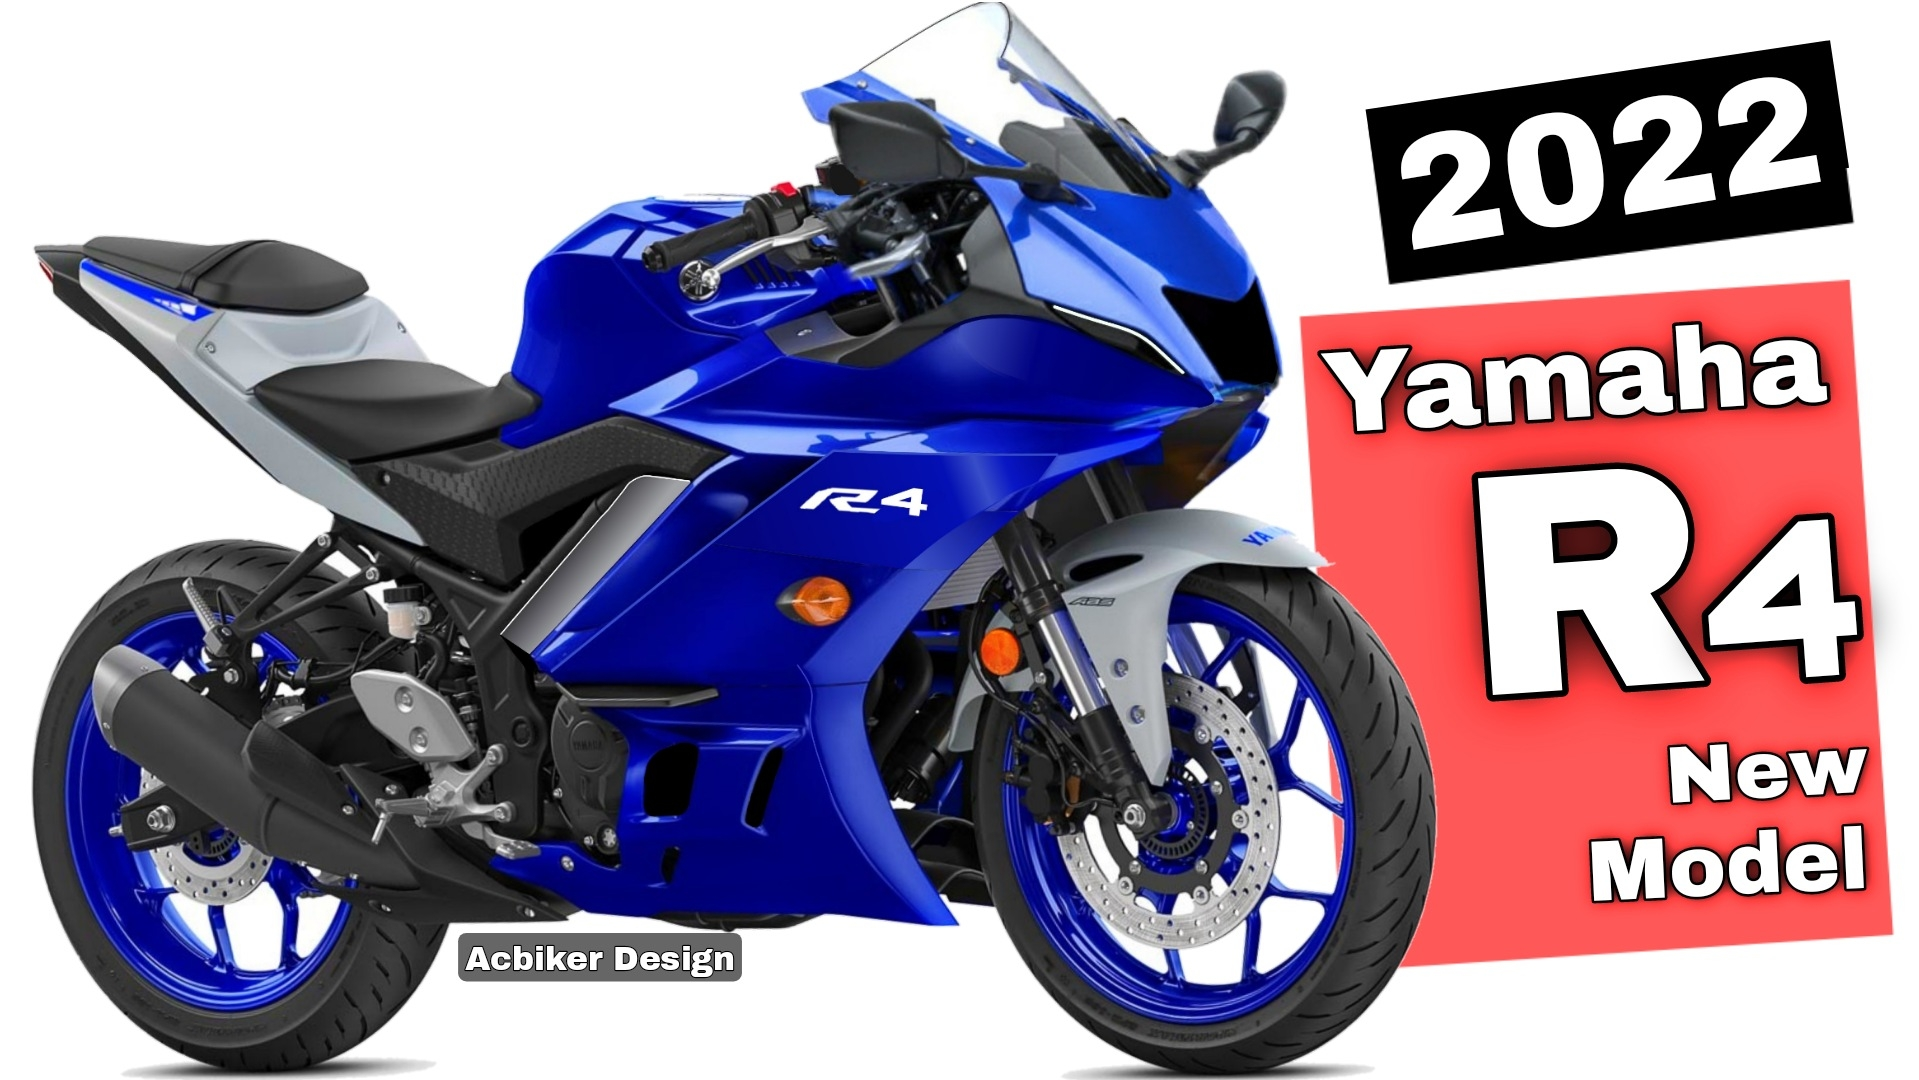 2022 yamaha R4, Yamaha R4, Yamaha YZF-R4, yamaha YZFR4, 2022 Yamaha R4, 2021 Yamaha R4, 2022 yamaha YZFR4, 2022 Yamaha YZF-R4,yamaha yzf r4,yamaha yzf r4 price in india,yamaha yzf r4 top speed,yamaha yzf r4 price in philippines, yamaha yzf r4 2020,yamaha yzf r4 2021,yamaha yzf r4 for sale,yamaha yzf r4 250cc price in philippines,yamaha yzf r4 250 precio